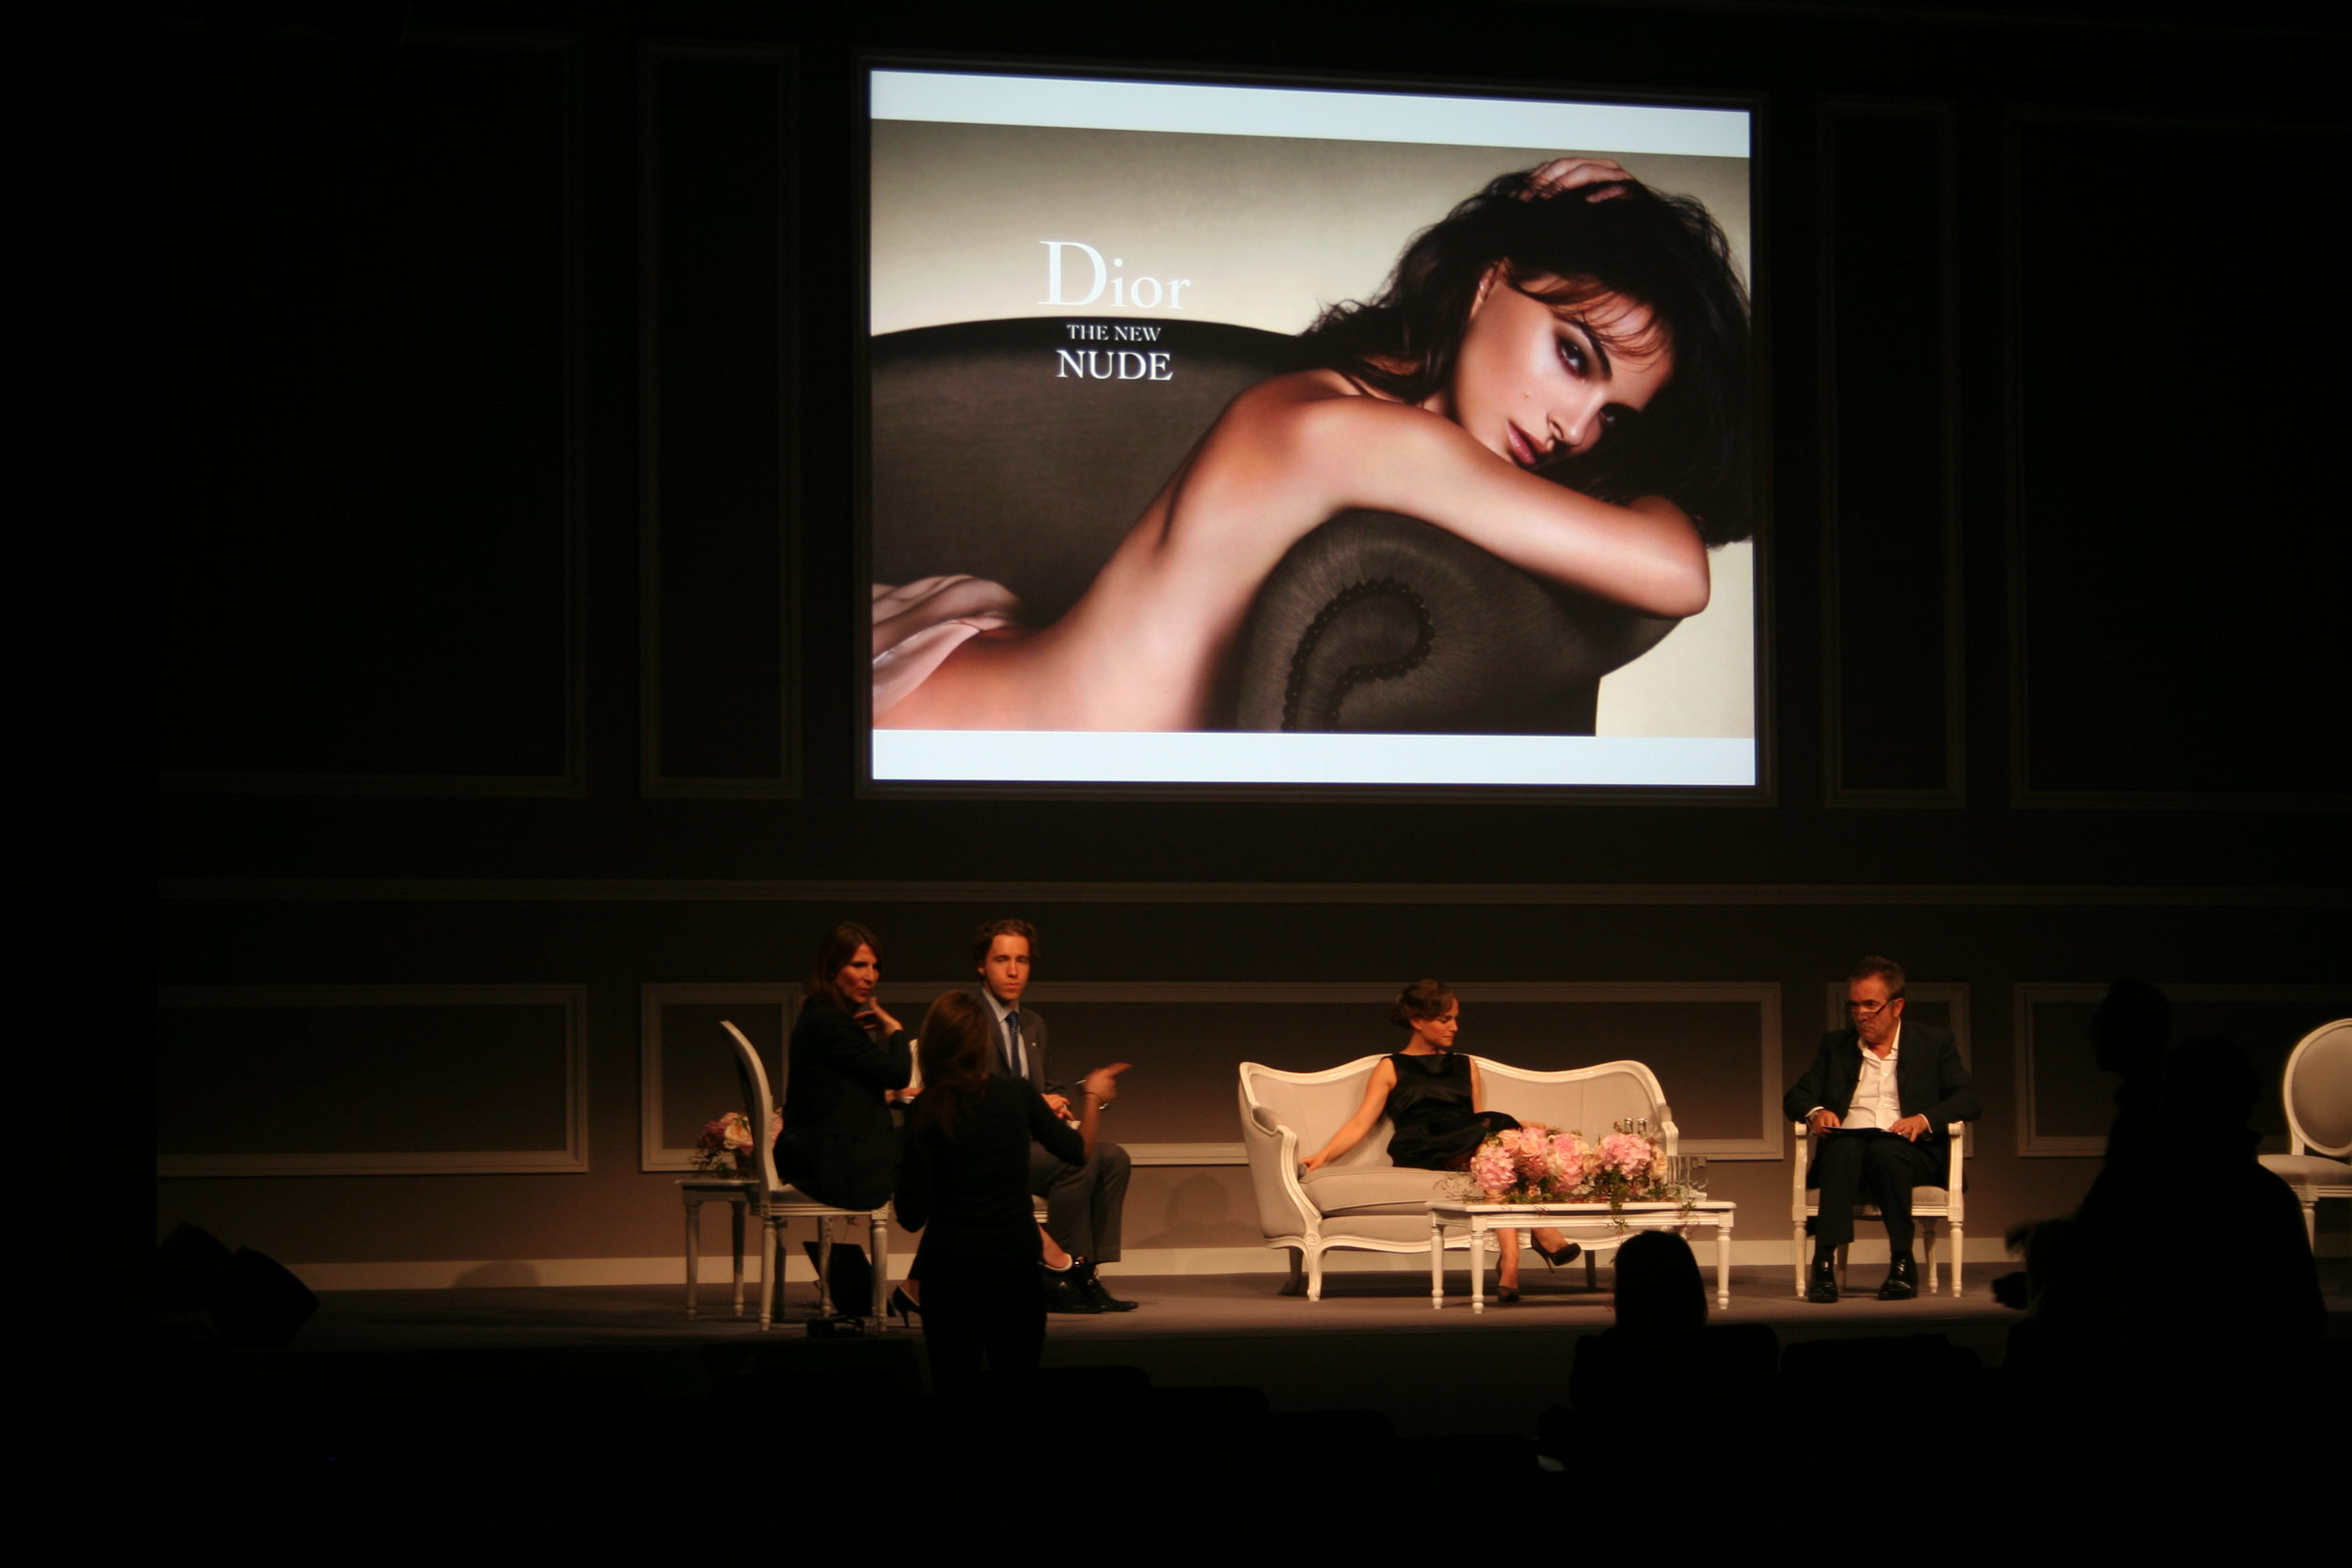 Dior_Nude_Paris_avril 2012_By Eve-Marine_217.JPG